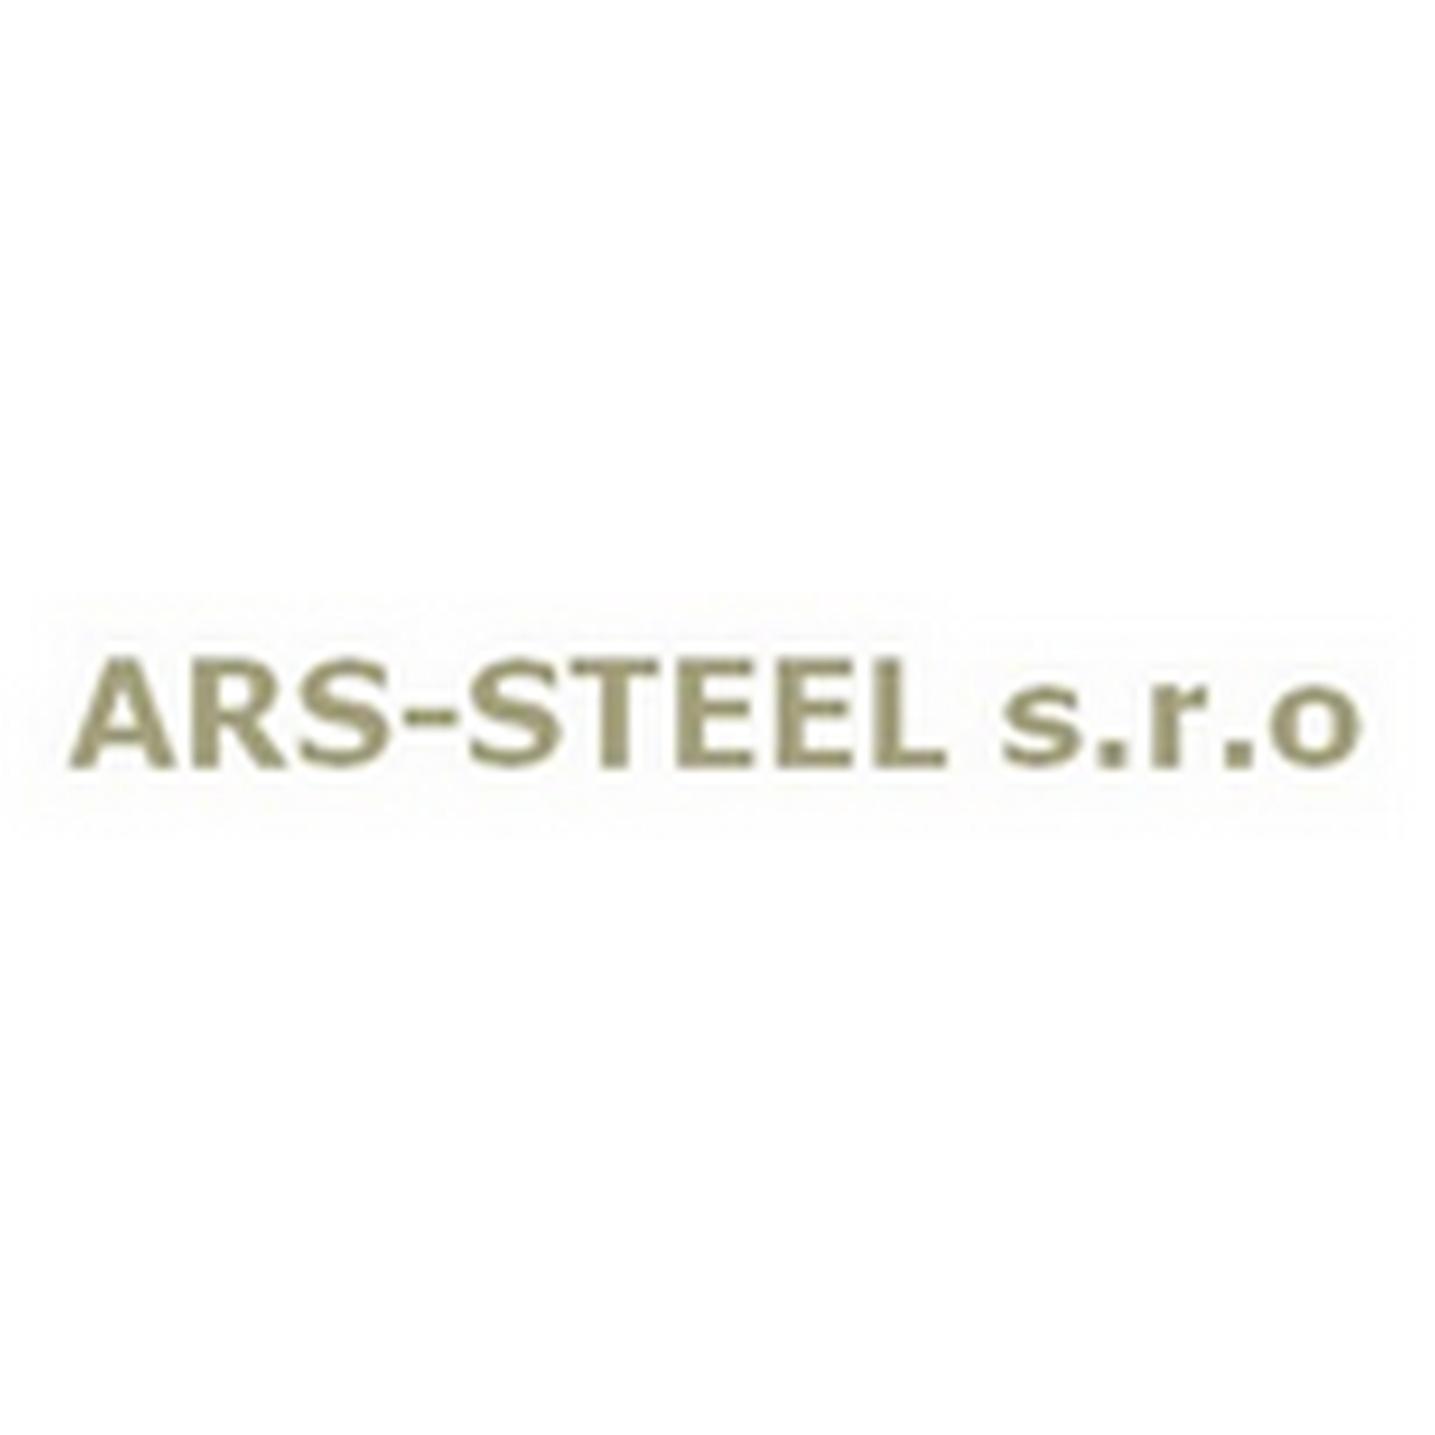 ARS STEEL s.r.o.